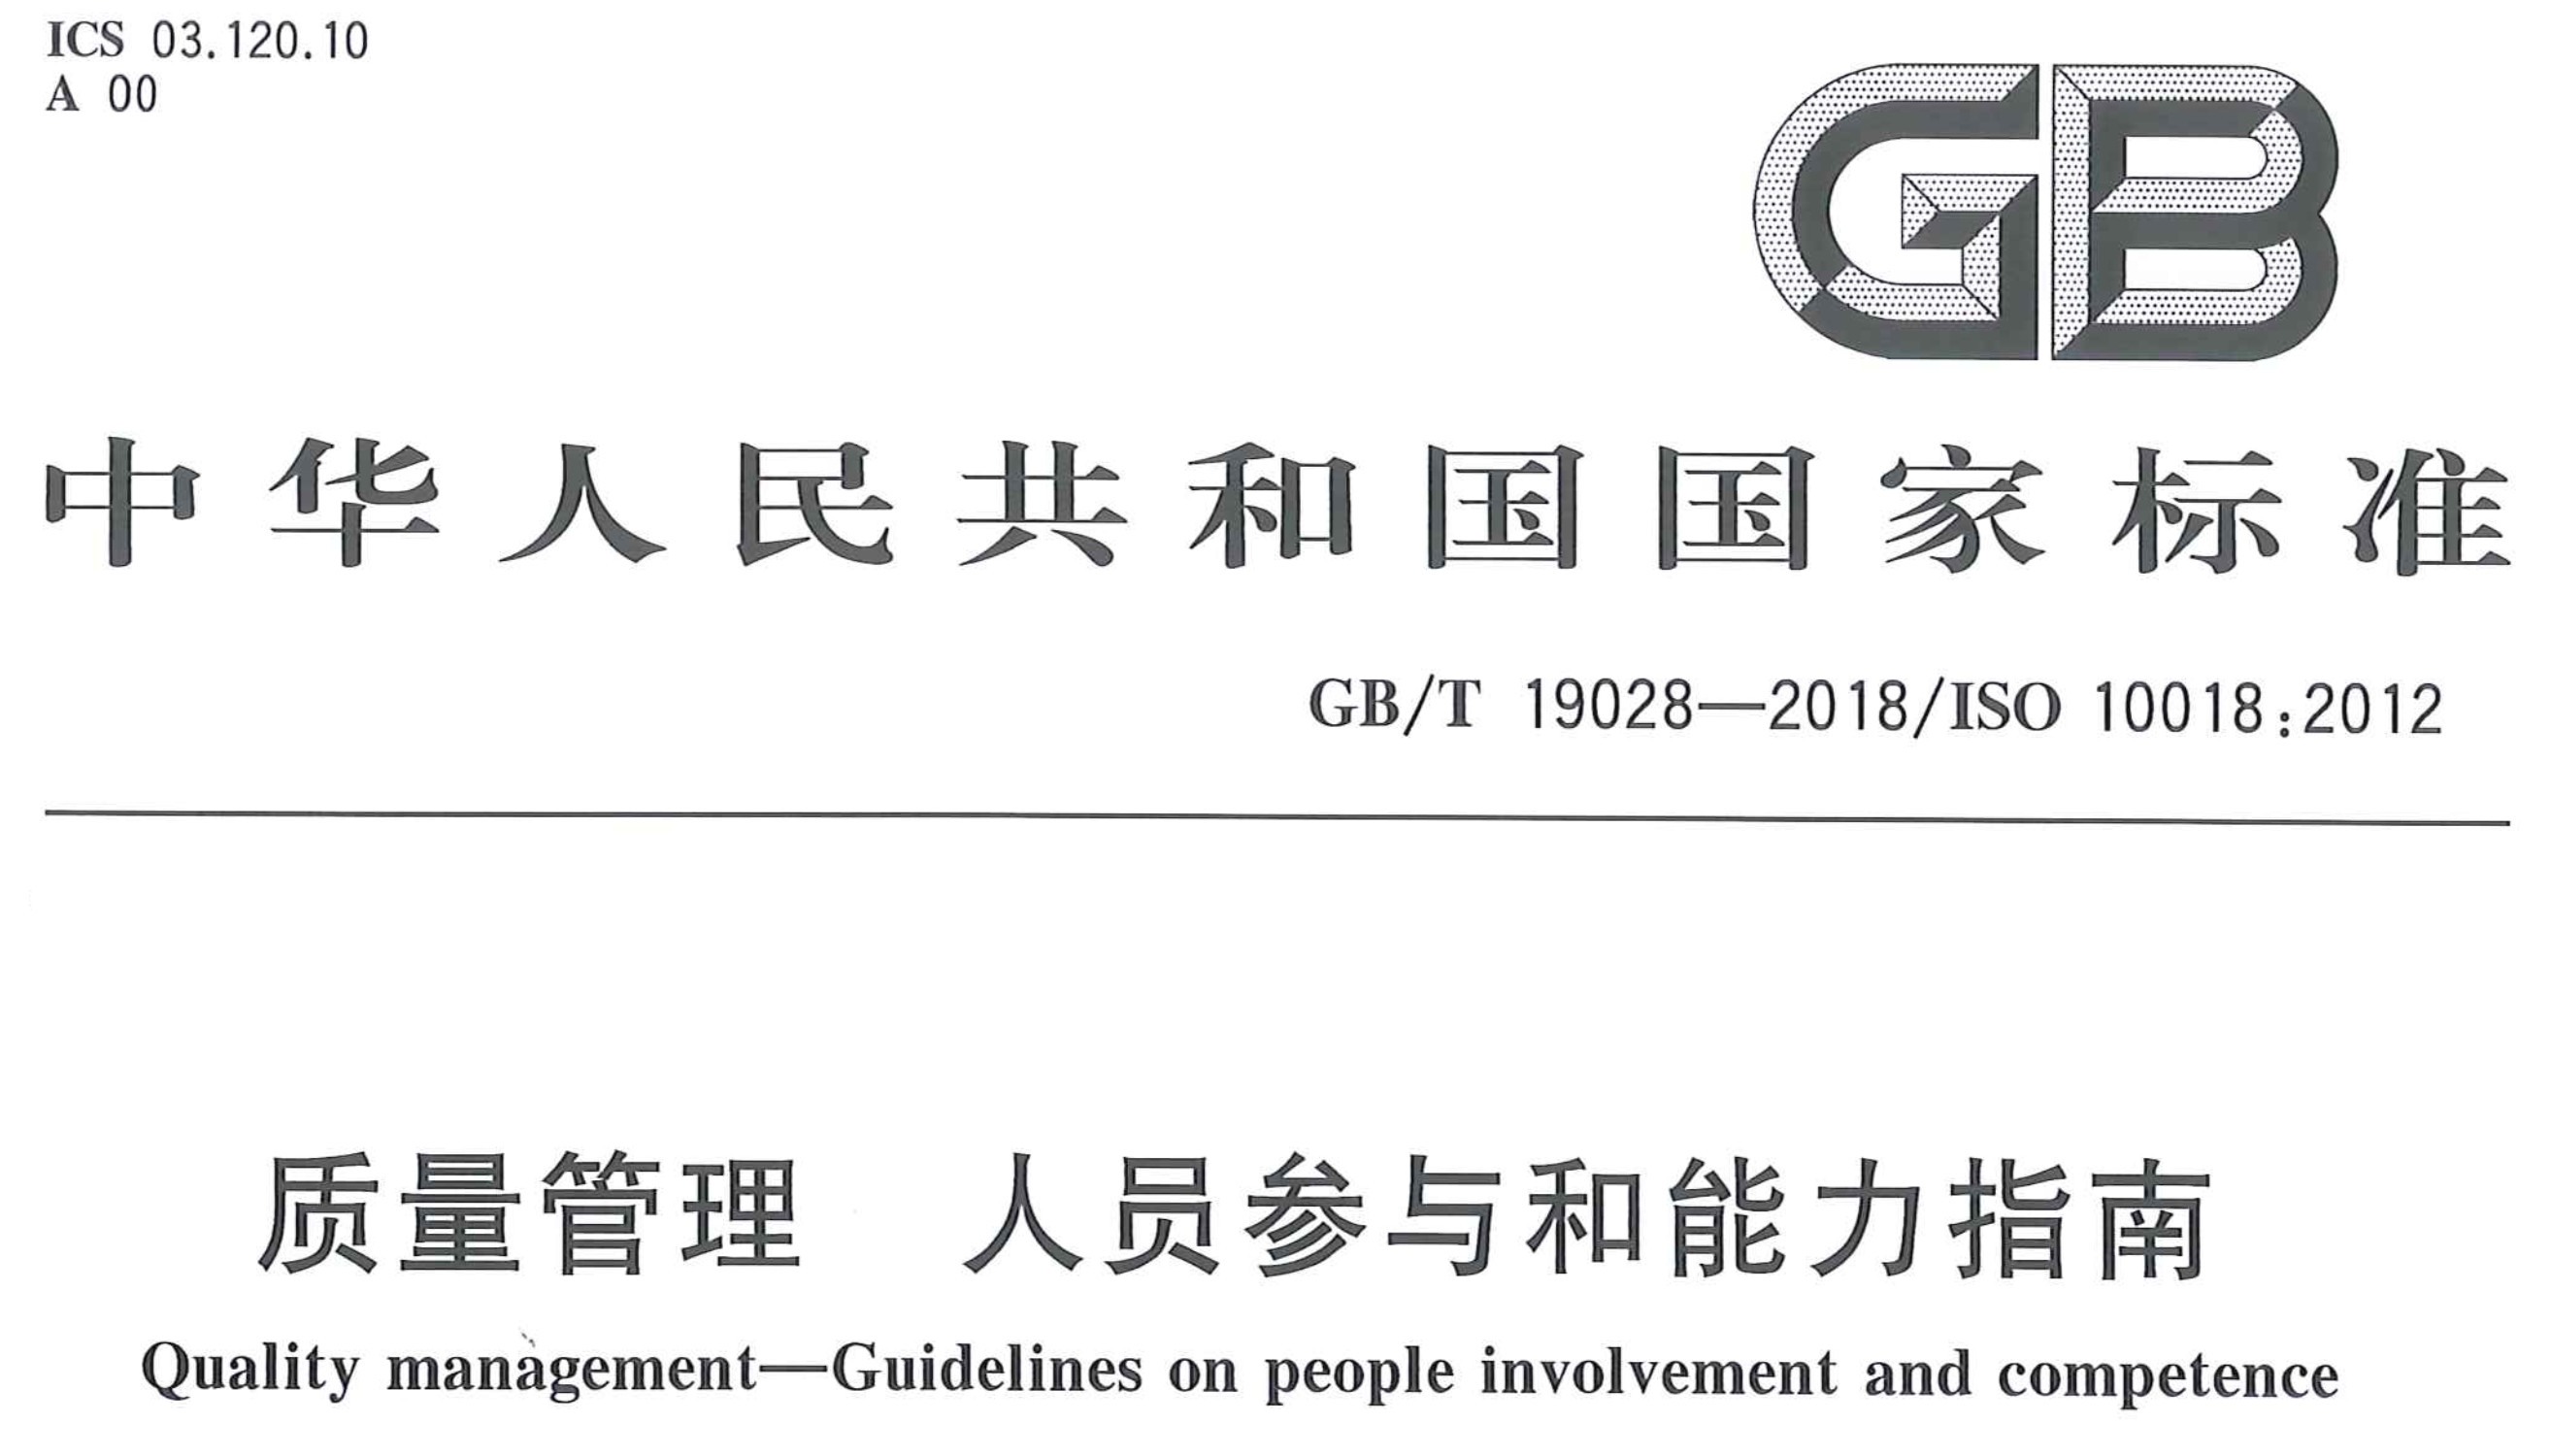 GB/T 19028-2018《质量管理 人员参与和能力指南》发布,7月1日实施!